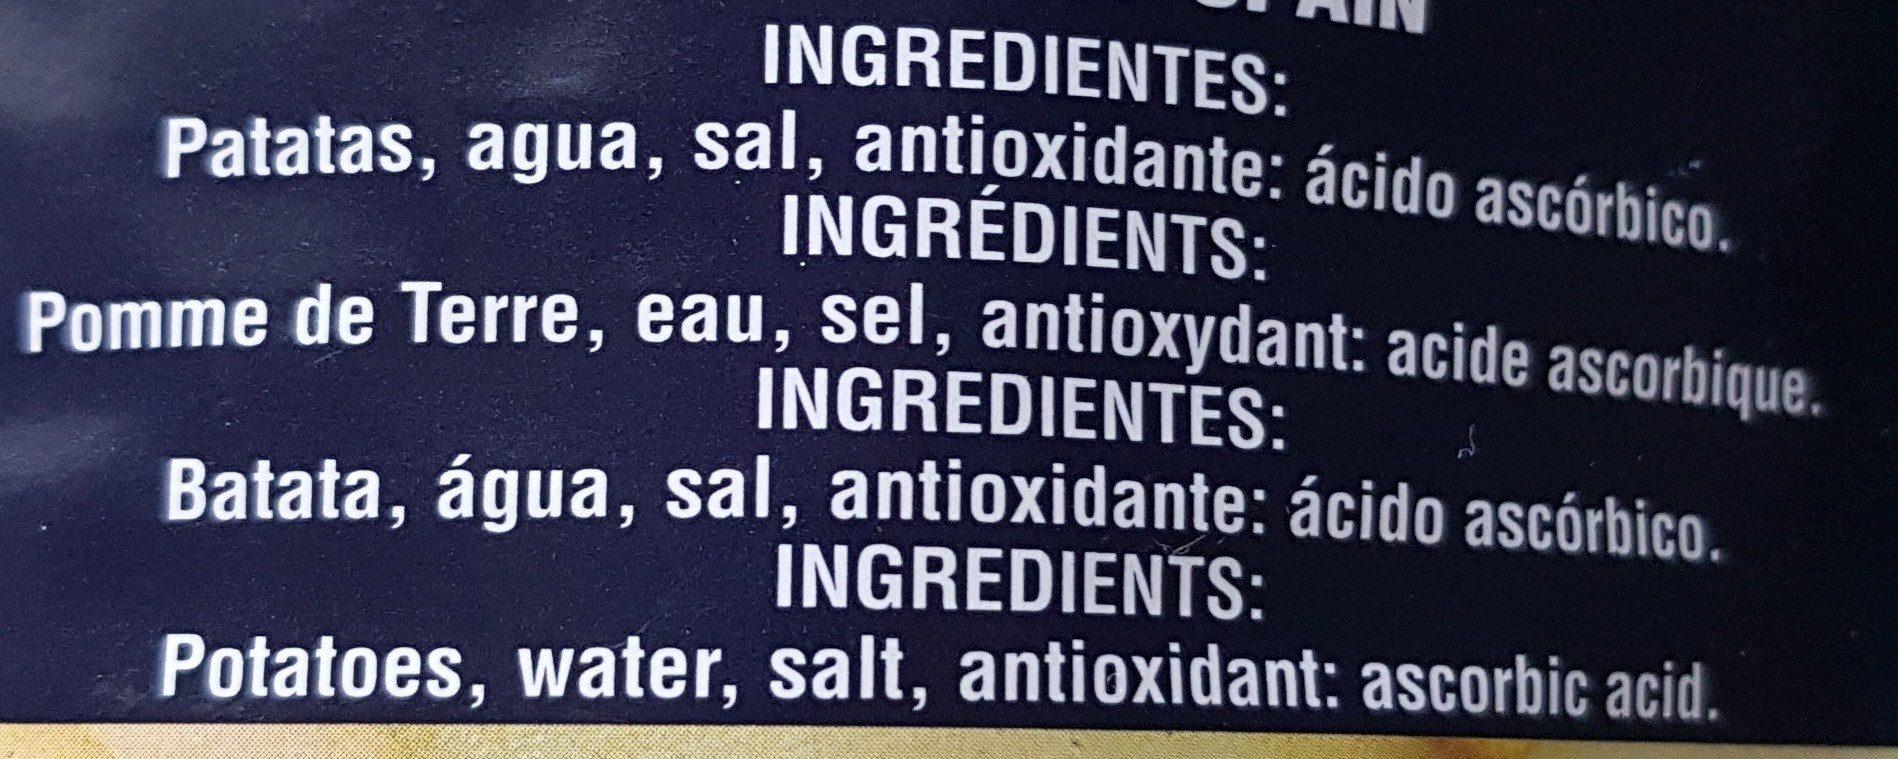 Pomme de terre entiers - Ingredientes